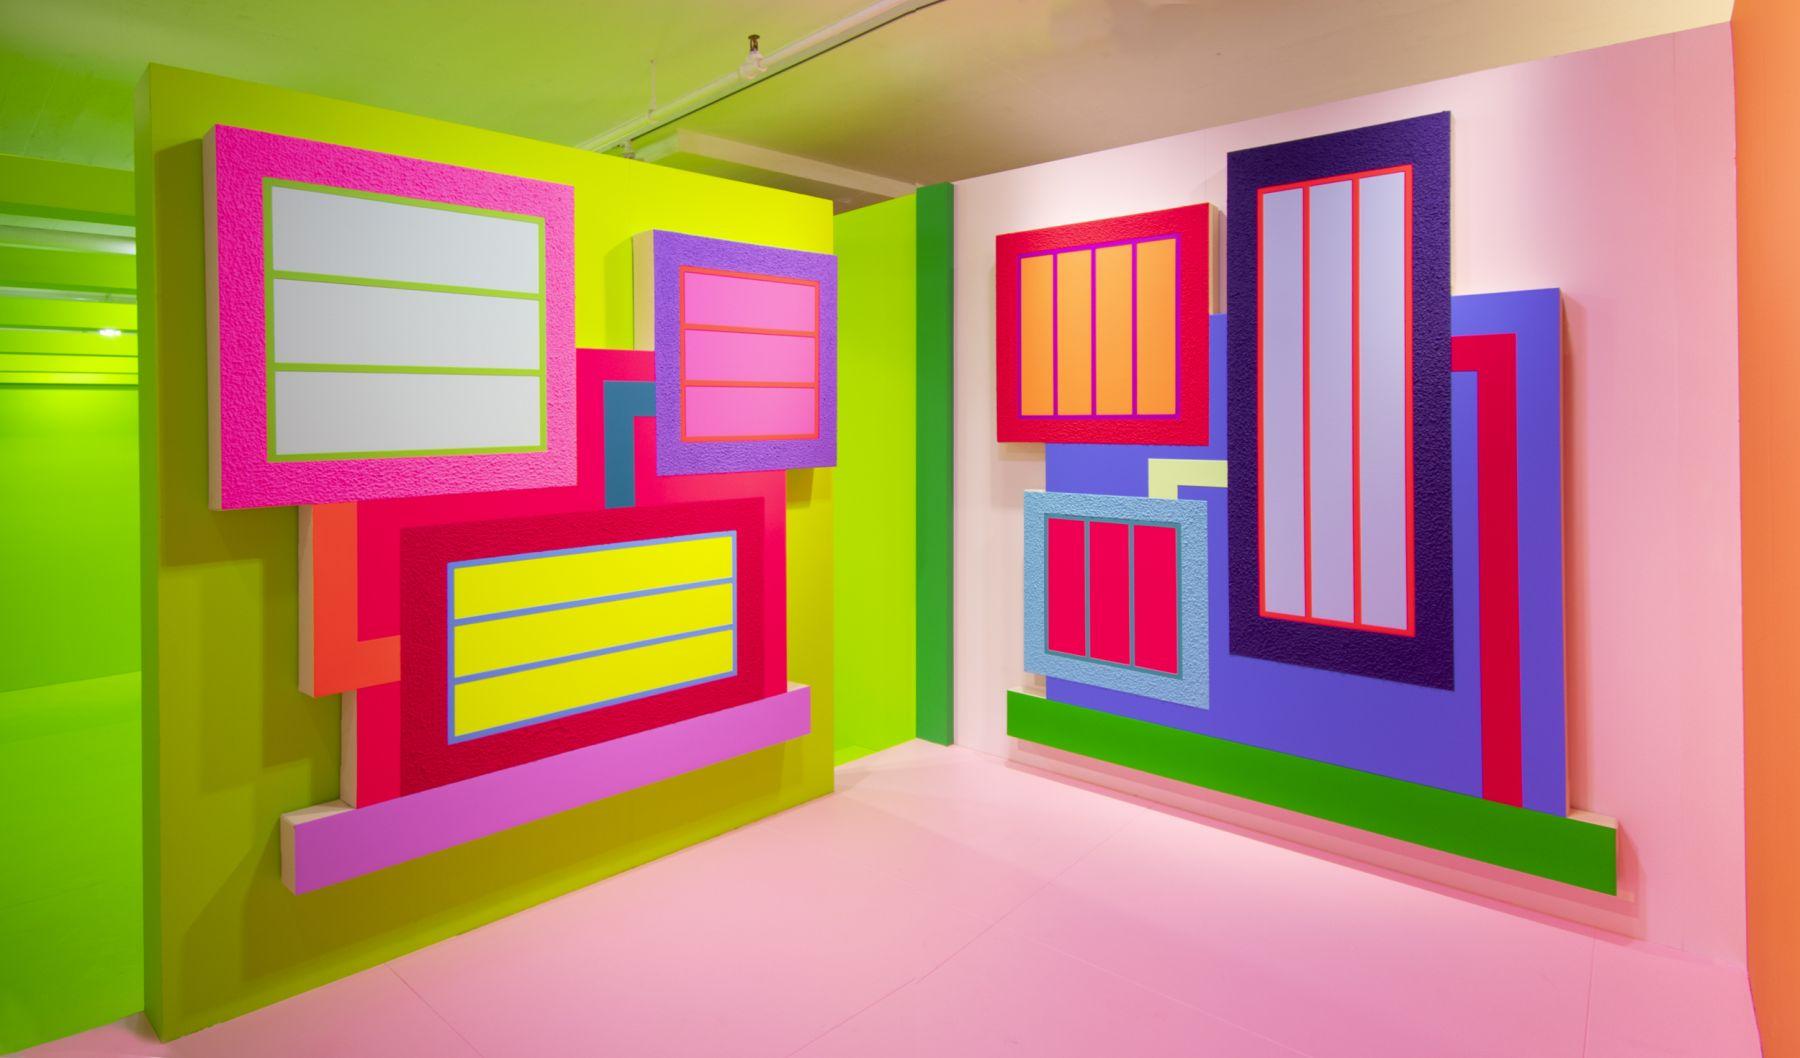 installation view. Greene Naftali, New York, 2019.